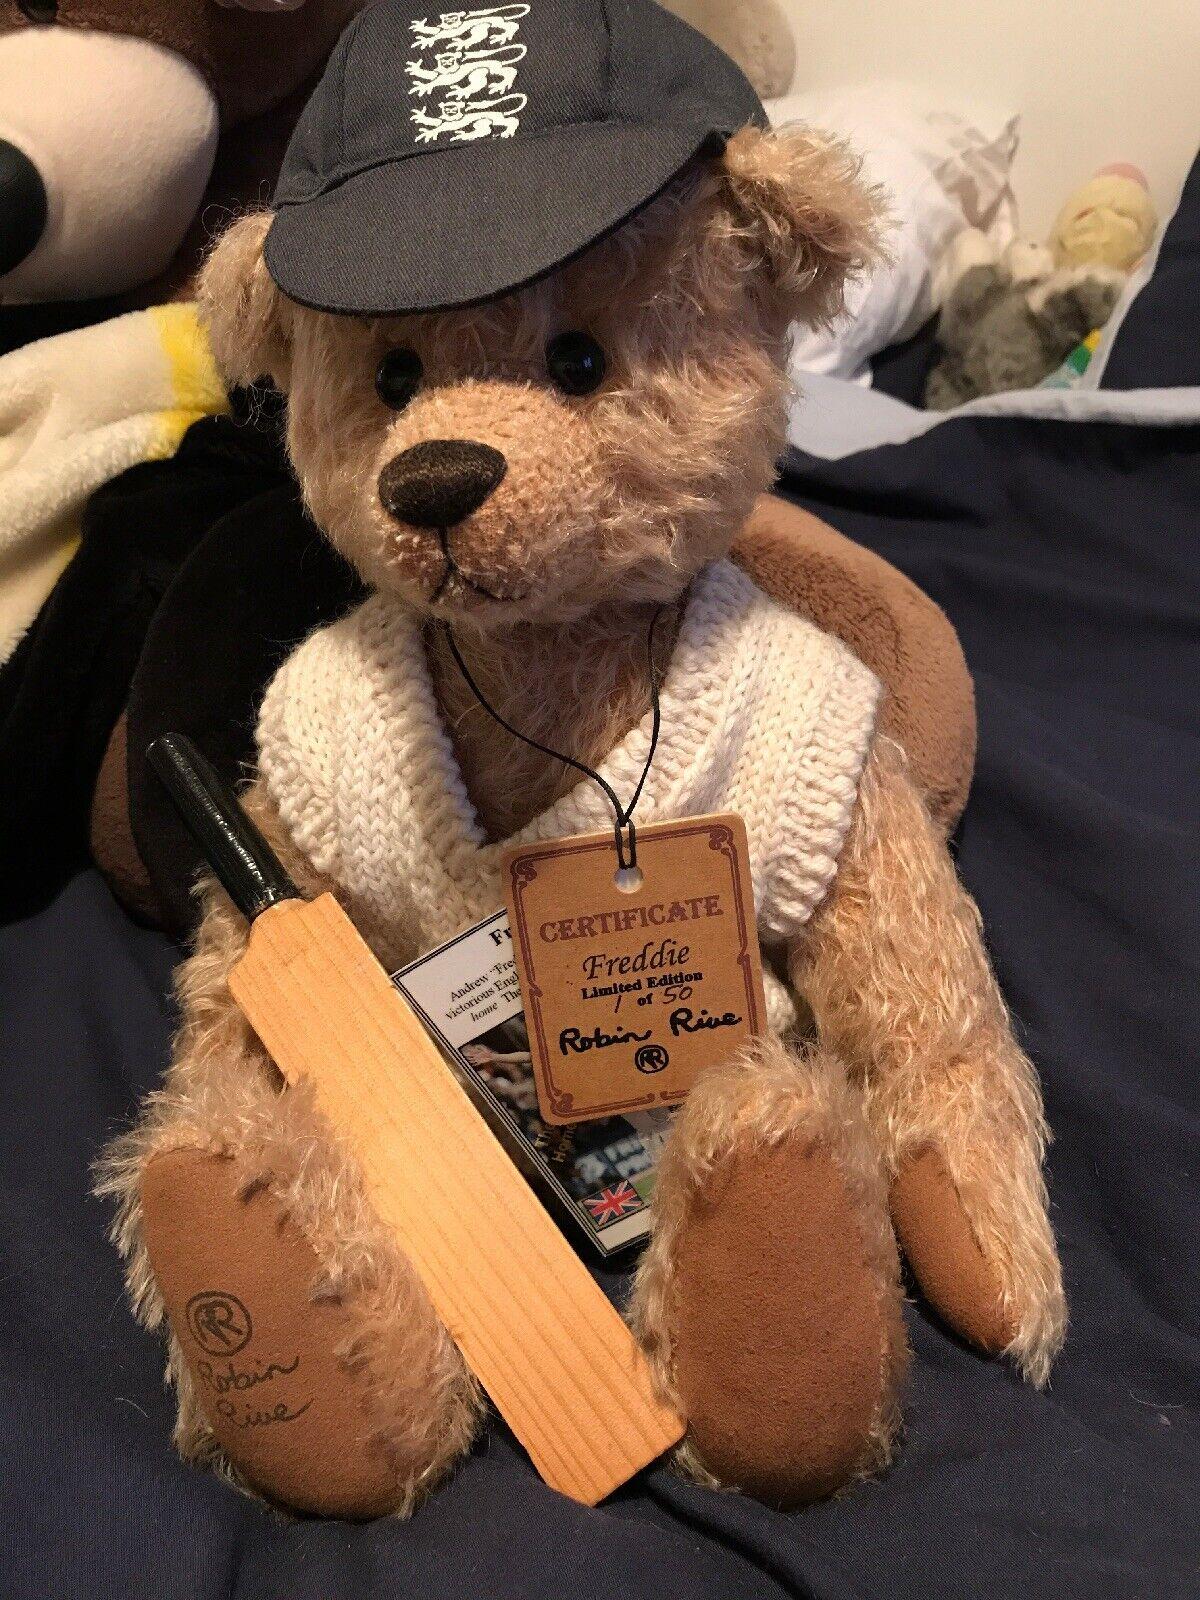 Collectors Teddy Bear Robin Rive Freddie Flintoff 1 Of 50